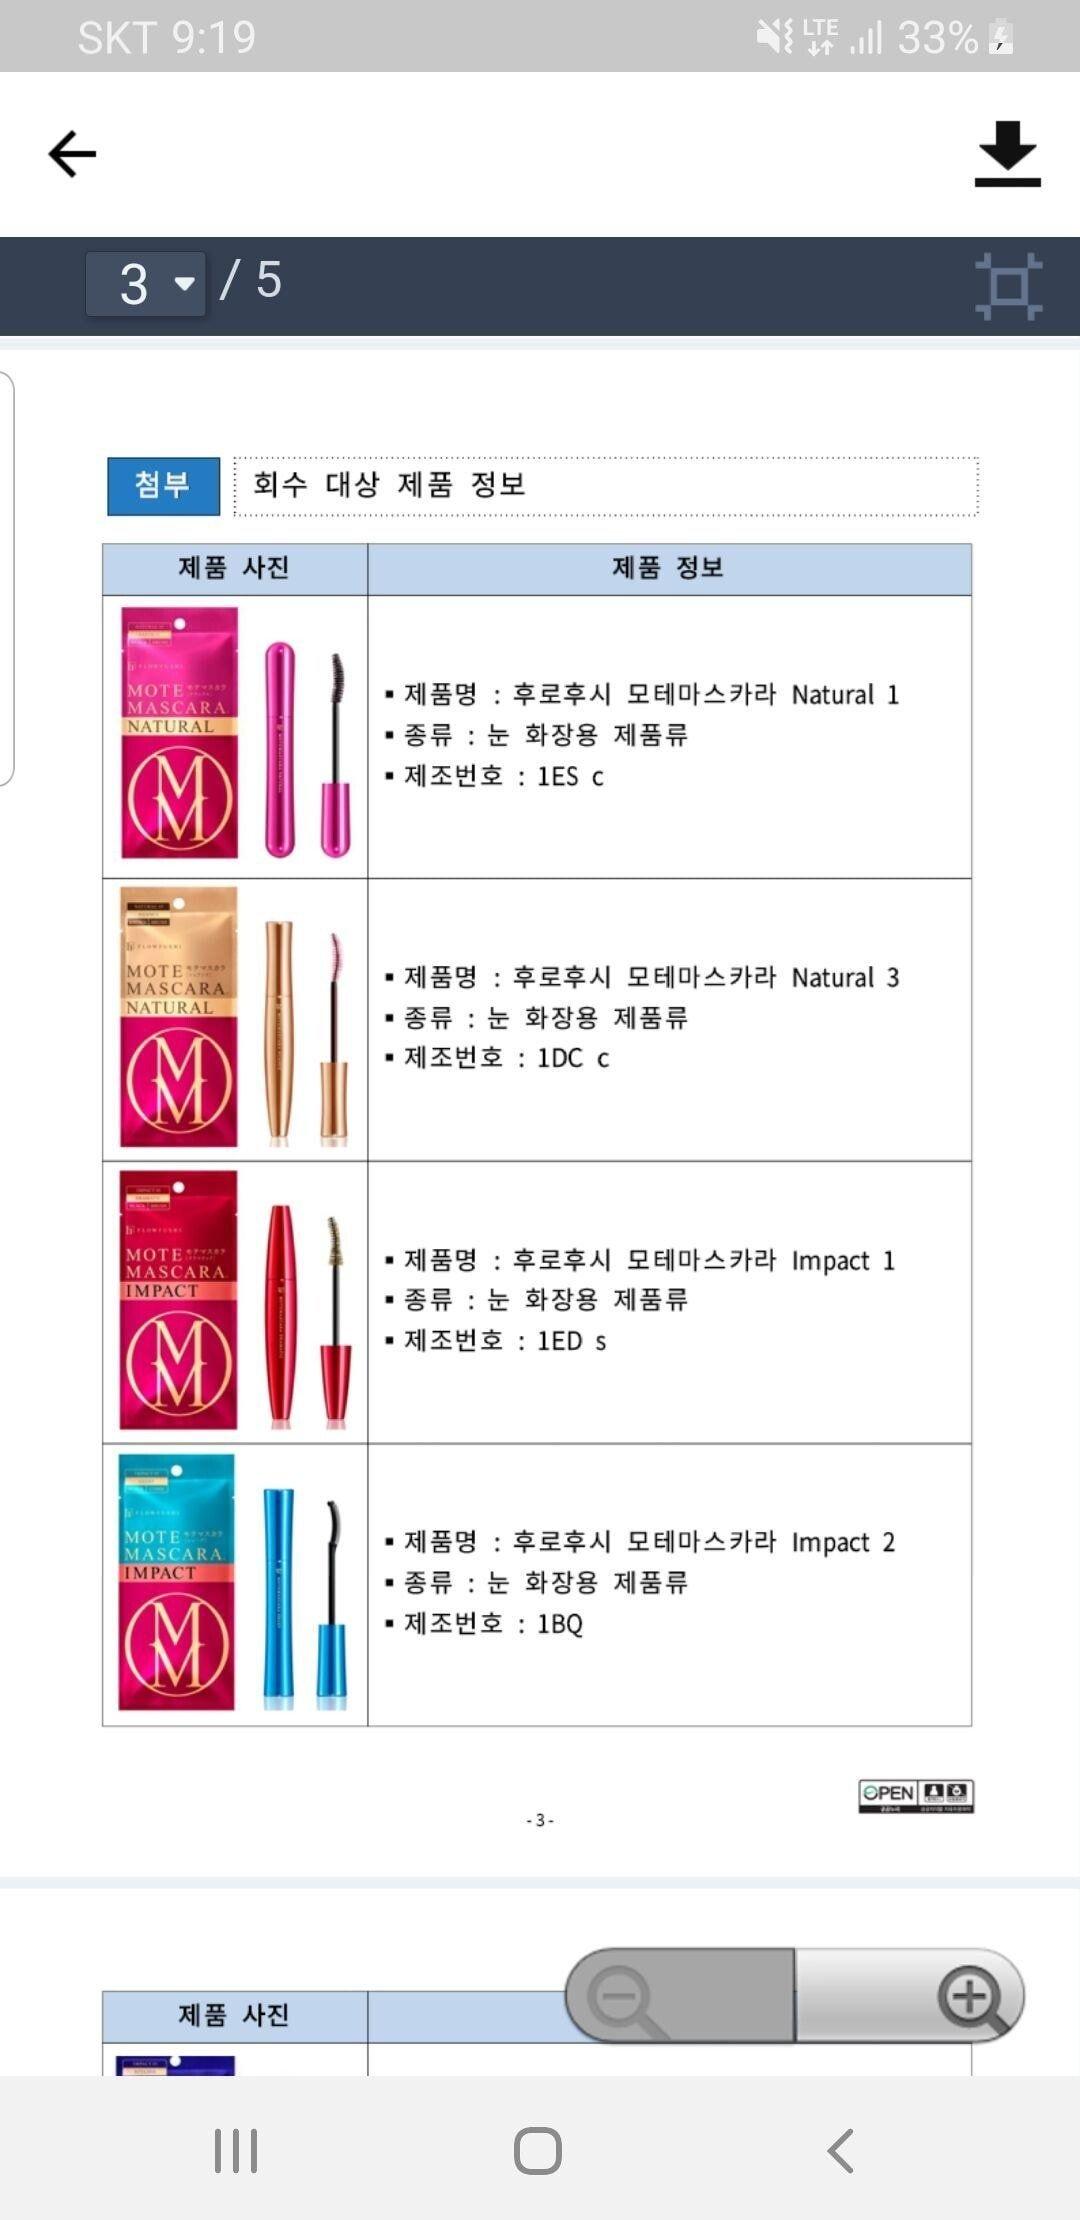 QSN2.jpg 일본산 화장품에서 우라늄 검출